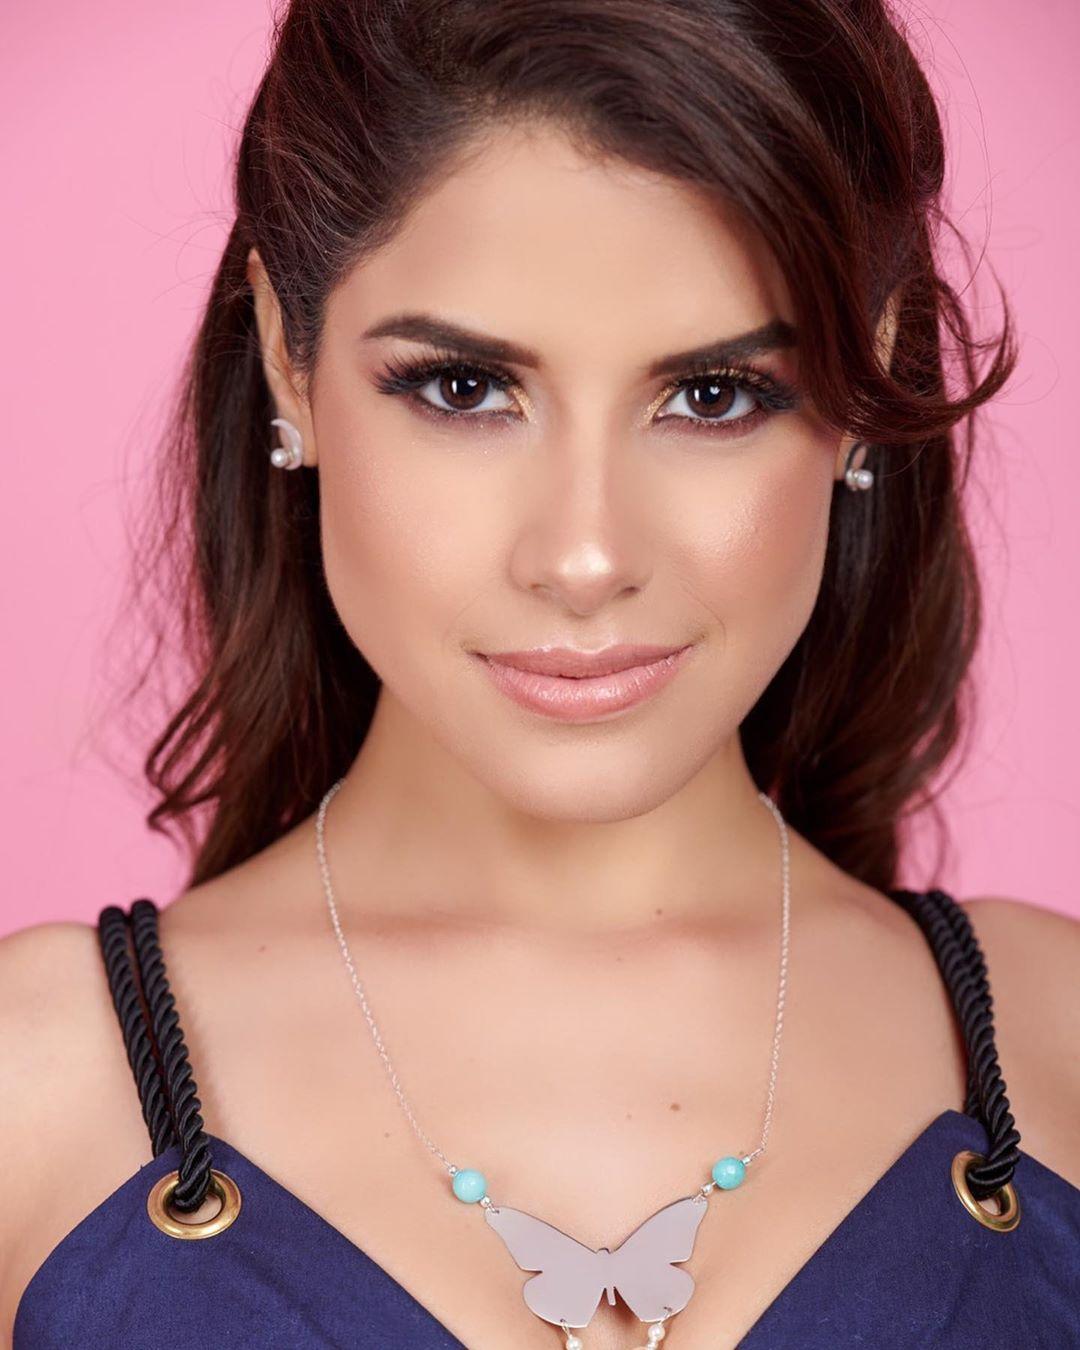 angella escudero, miss world peru 2019. - Página 3 70520310